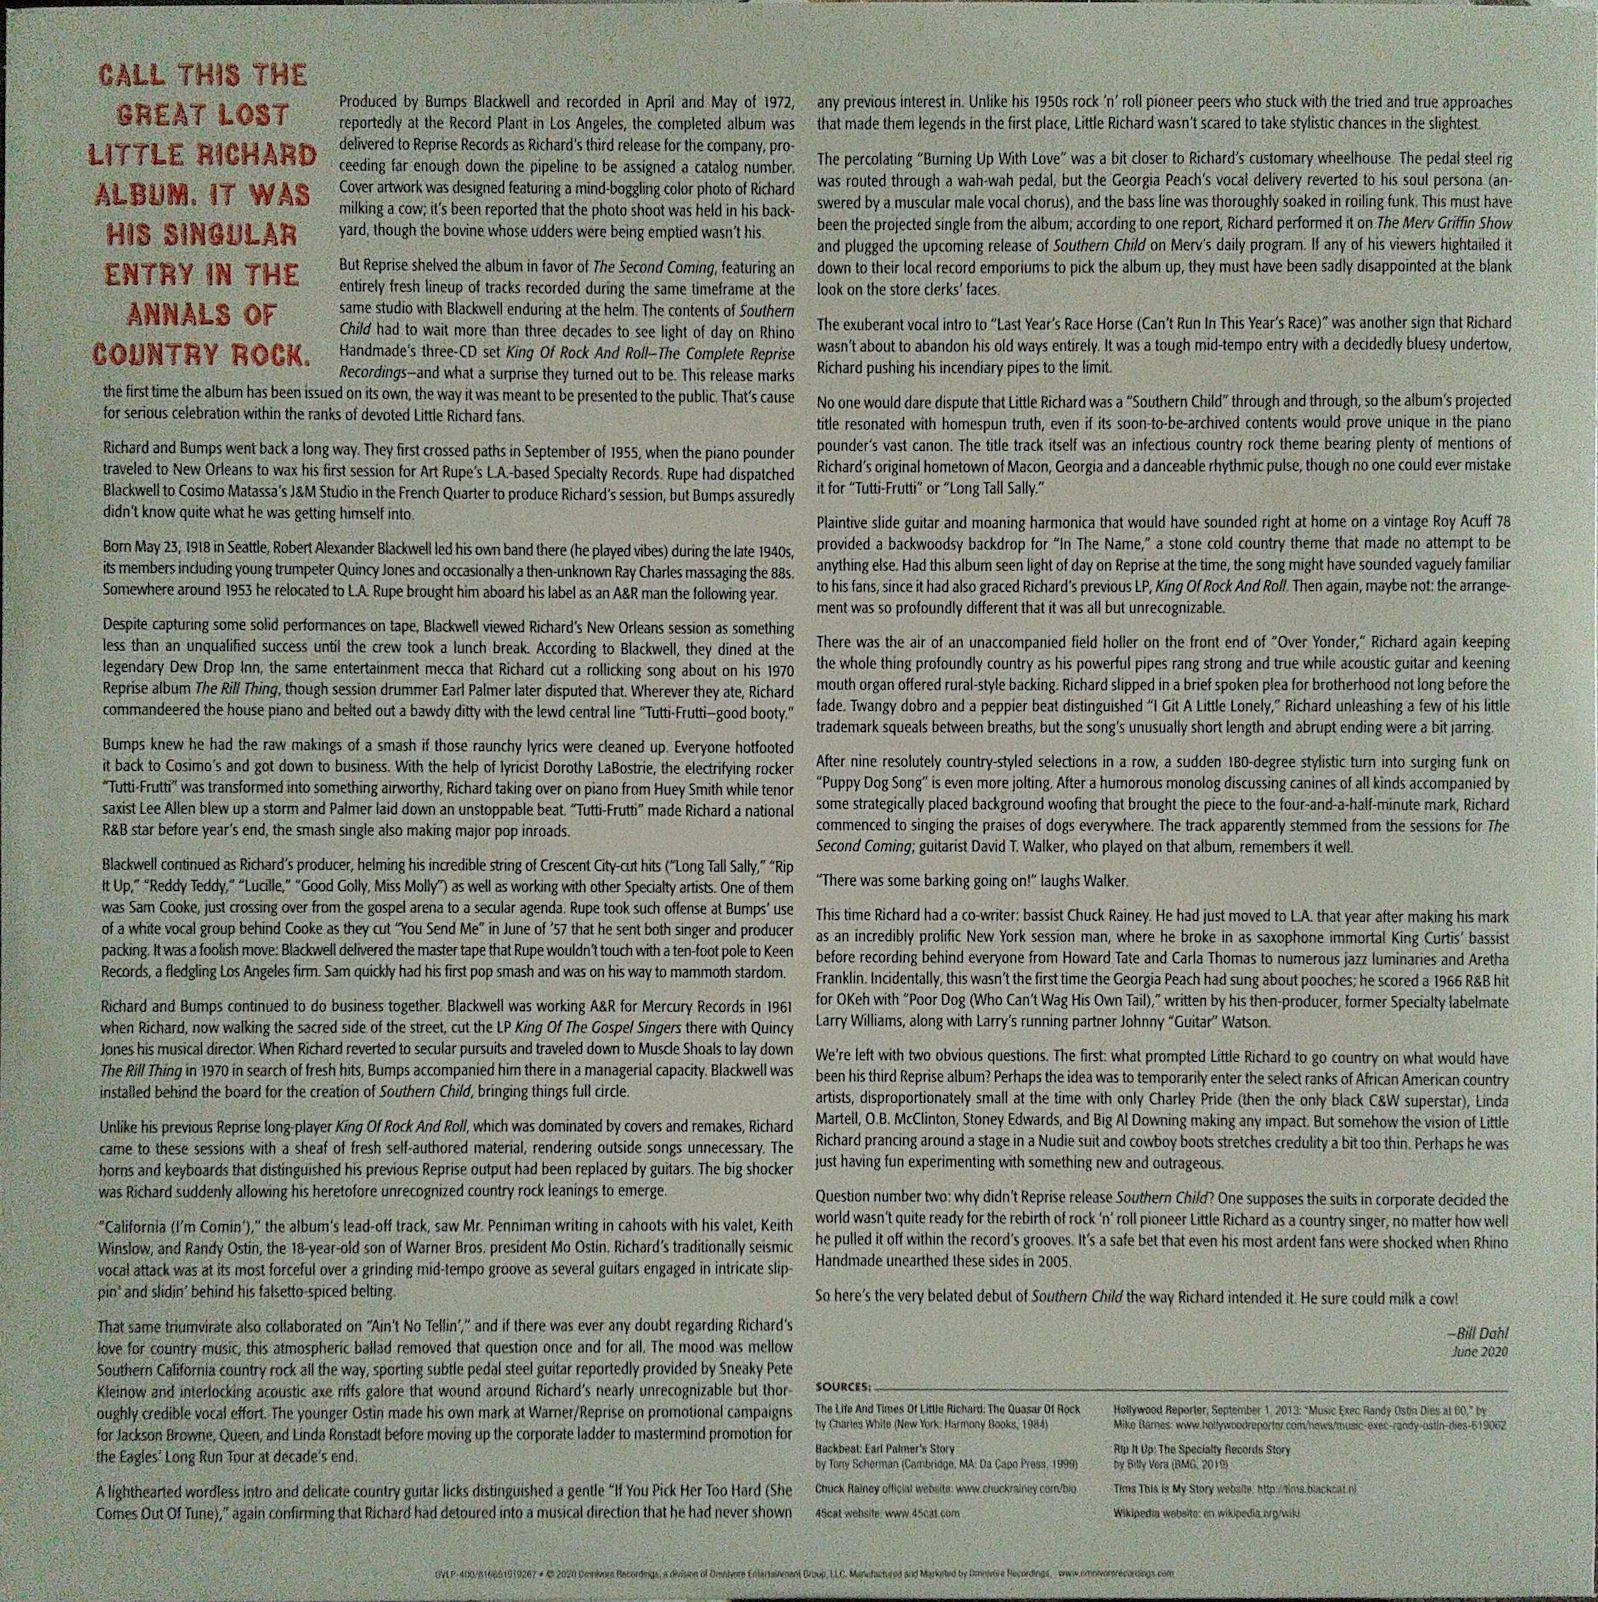 http://music.3sky.de/LittleRichard/LPs/LPlabel/southern_child_innersleeve_b.jpg